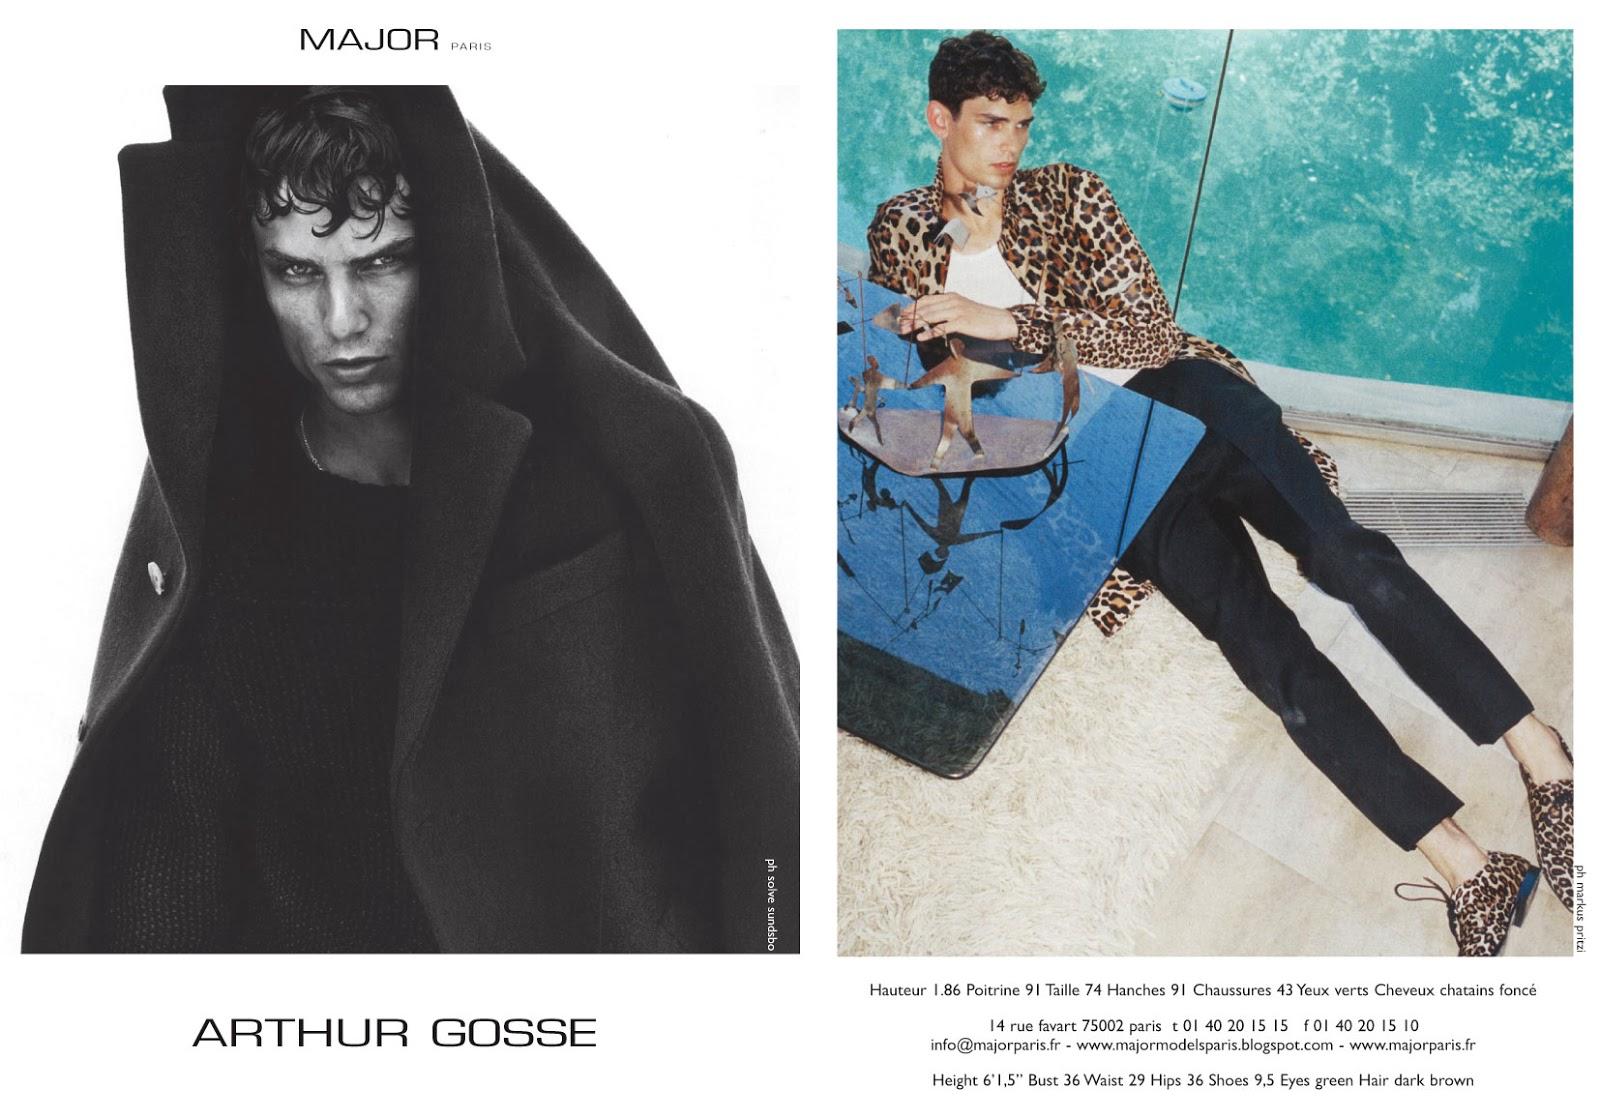 Major Paris Fall/Winter 2014 Show Package | Paris Fashion Week image